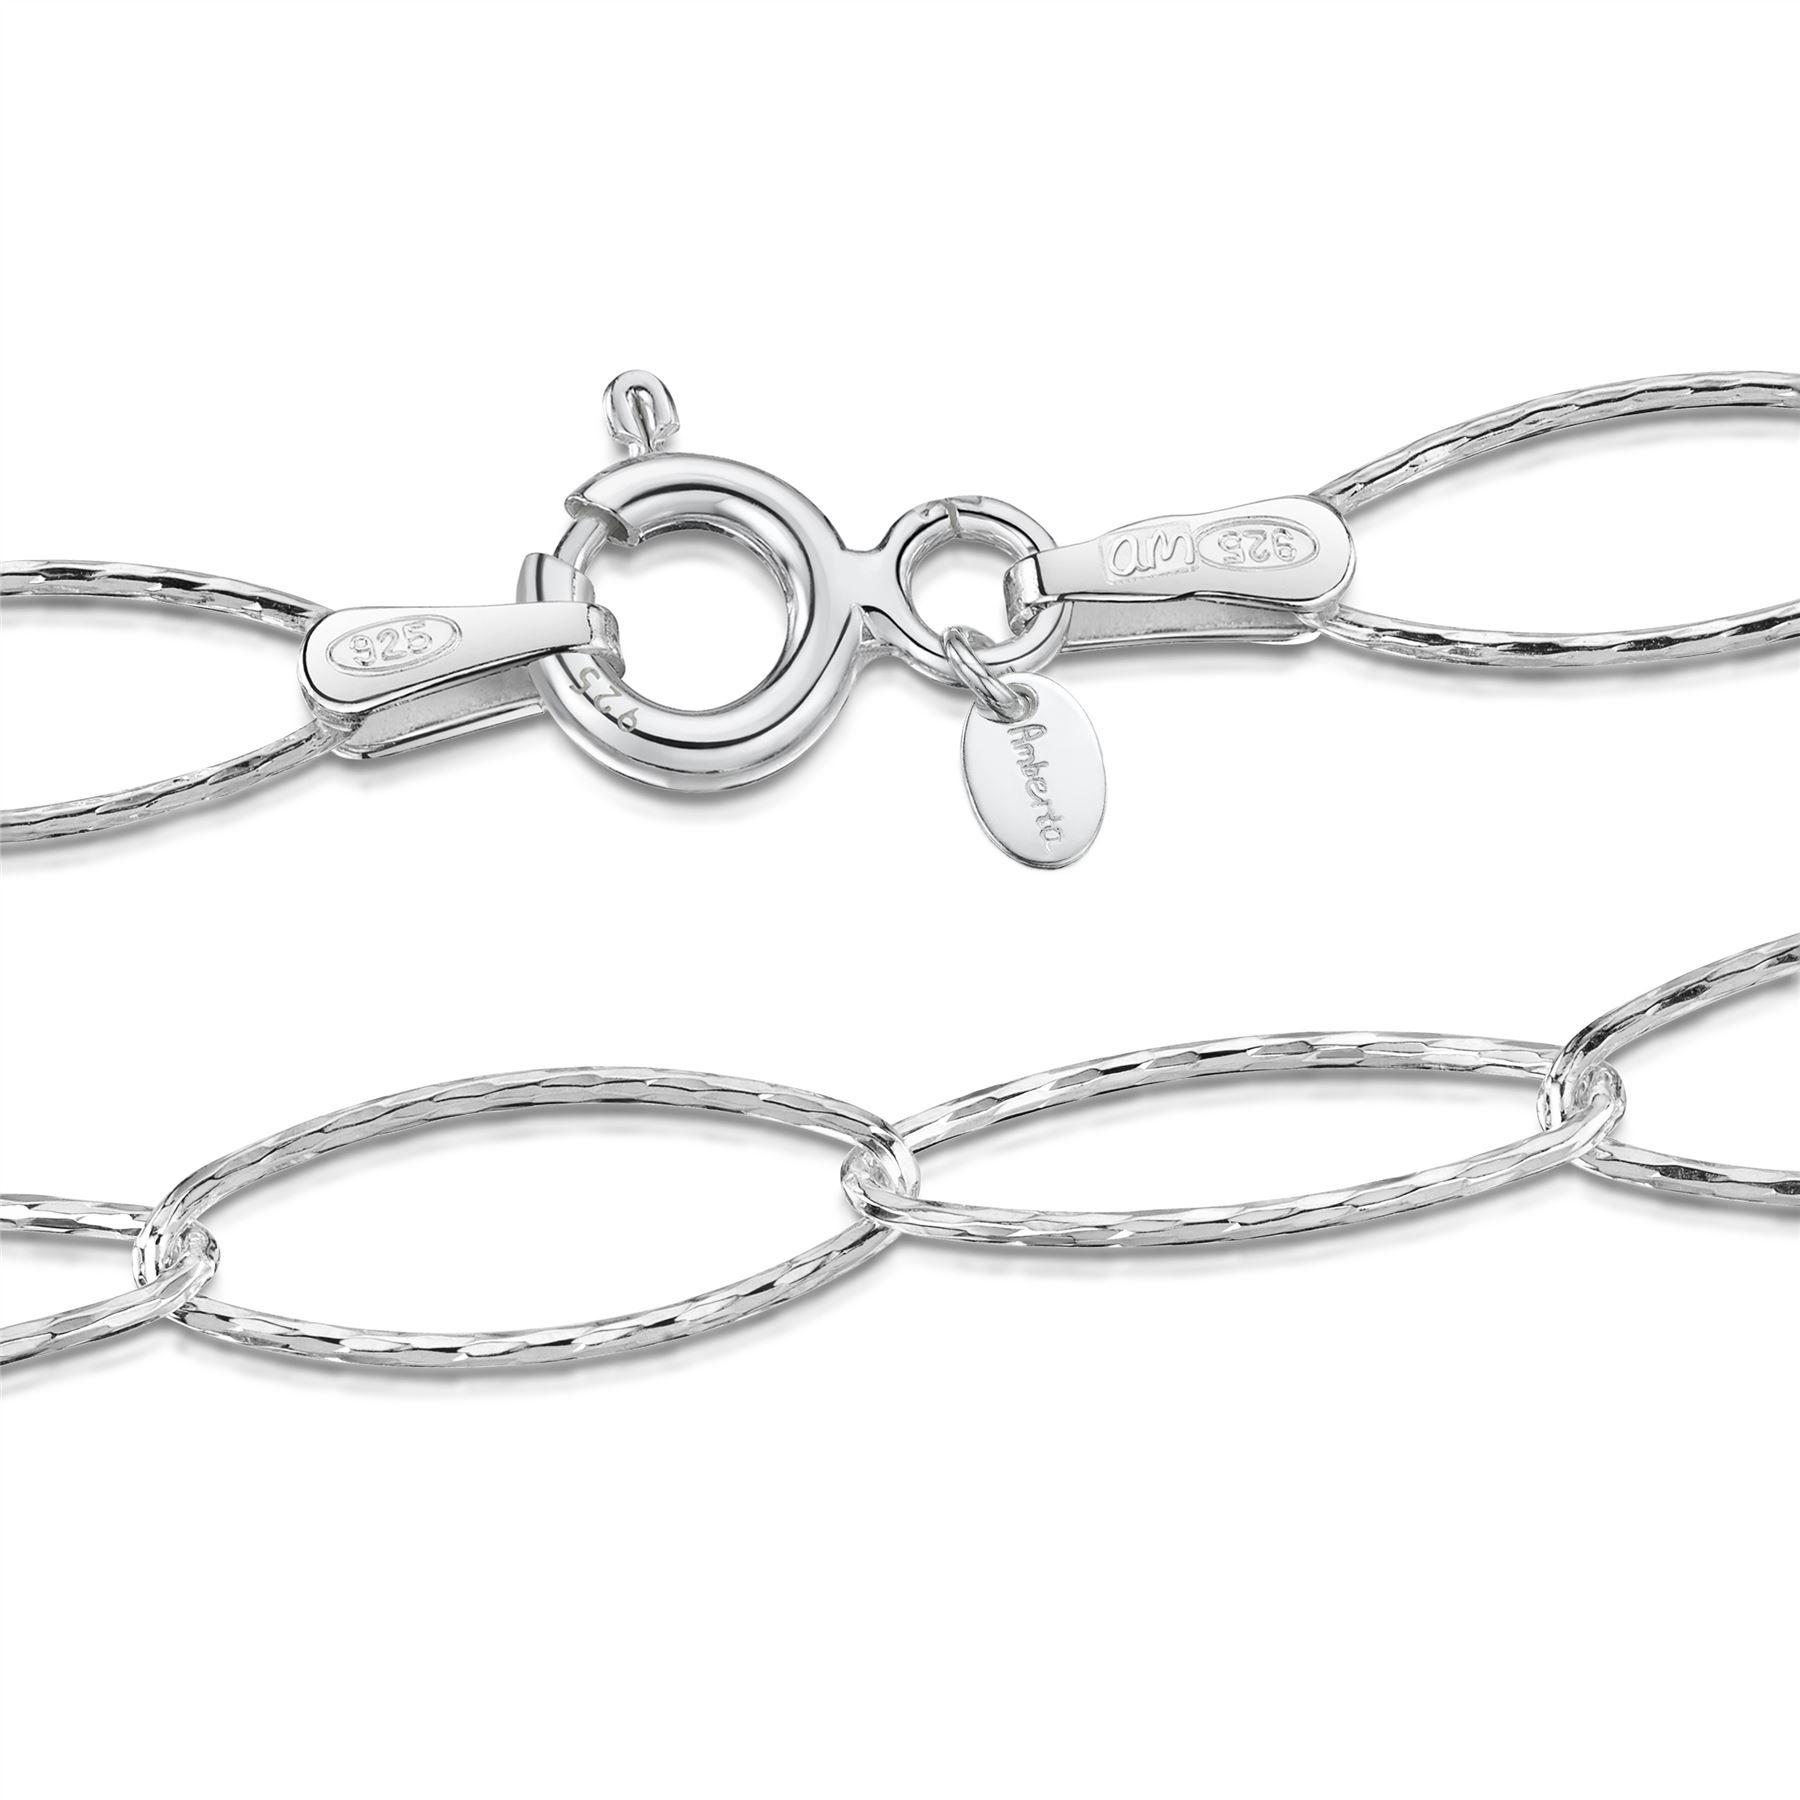 Amberta-Jewelry-925-Sterling-Silver-Adjustable-Anklet-Foot-Bracelet-for-Women miniature 52